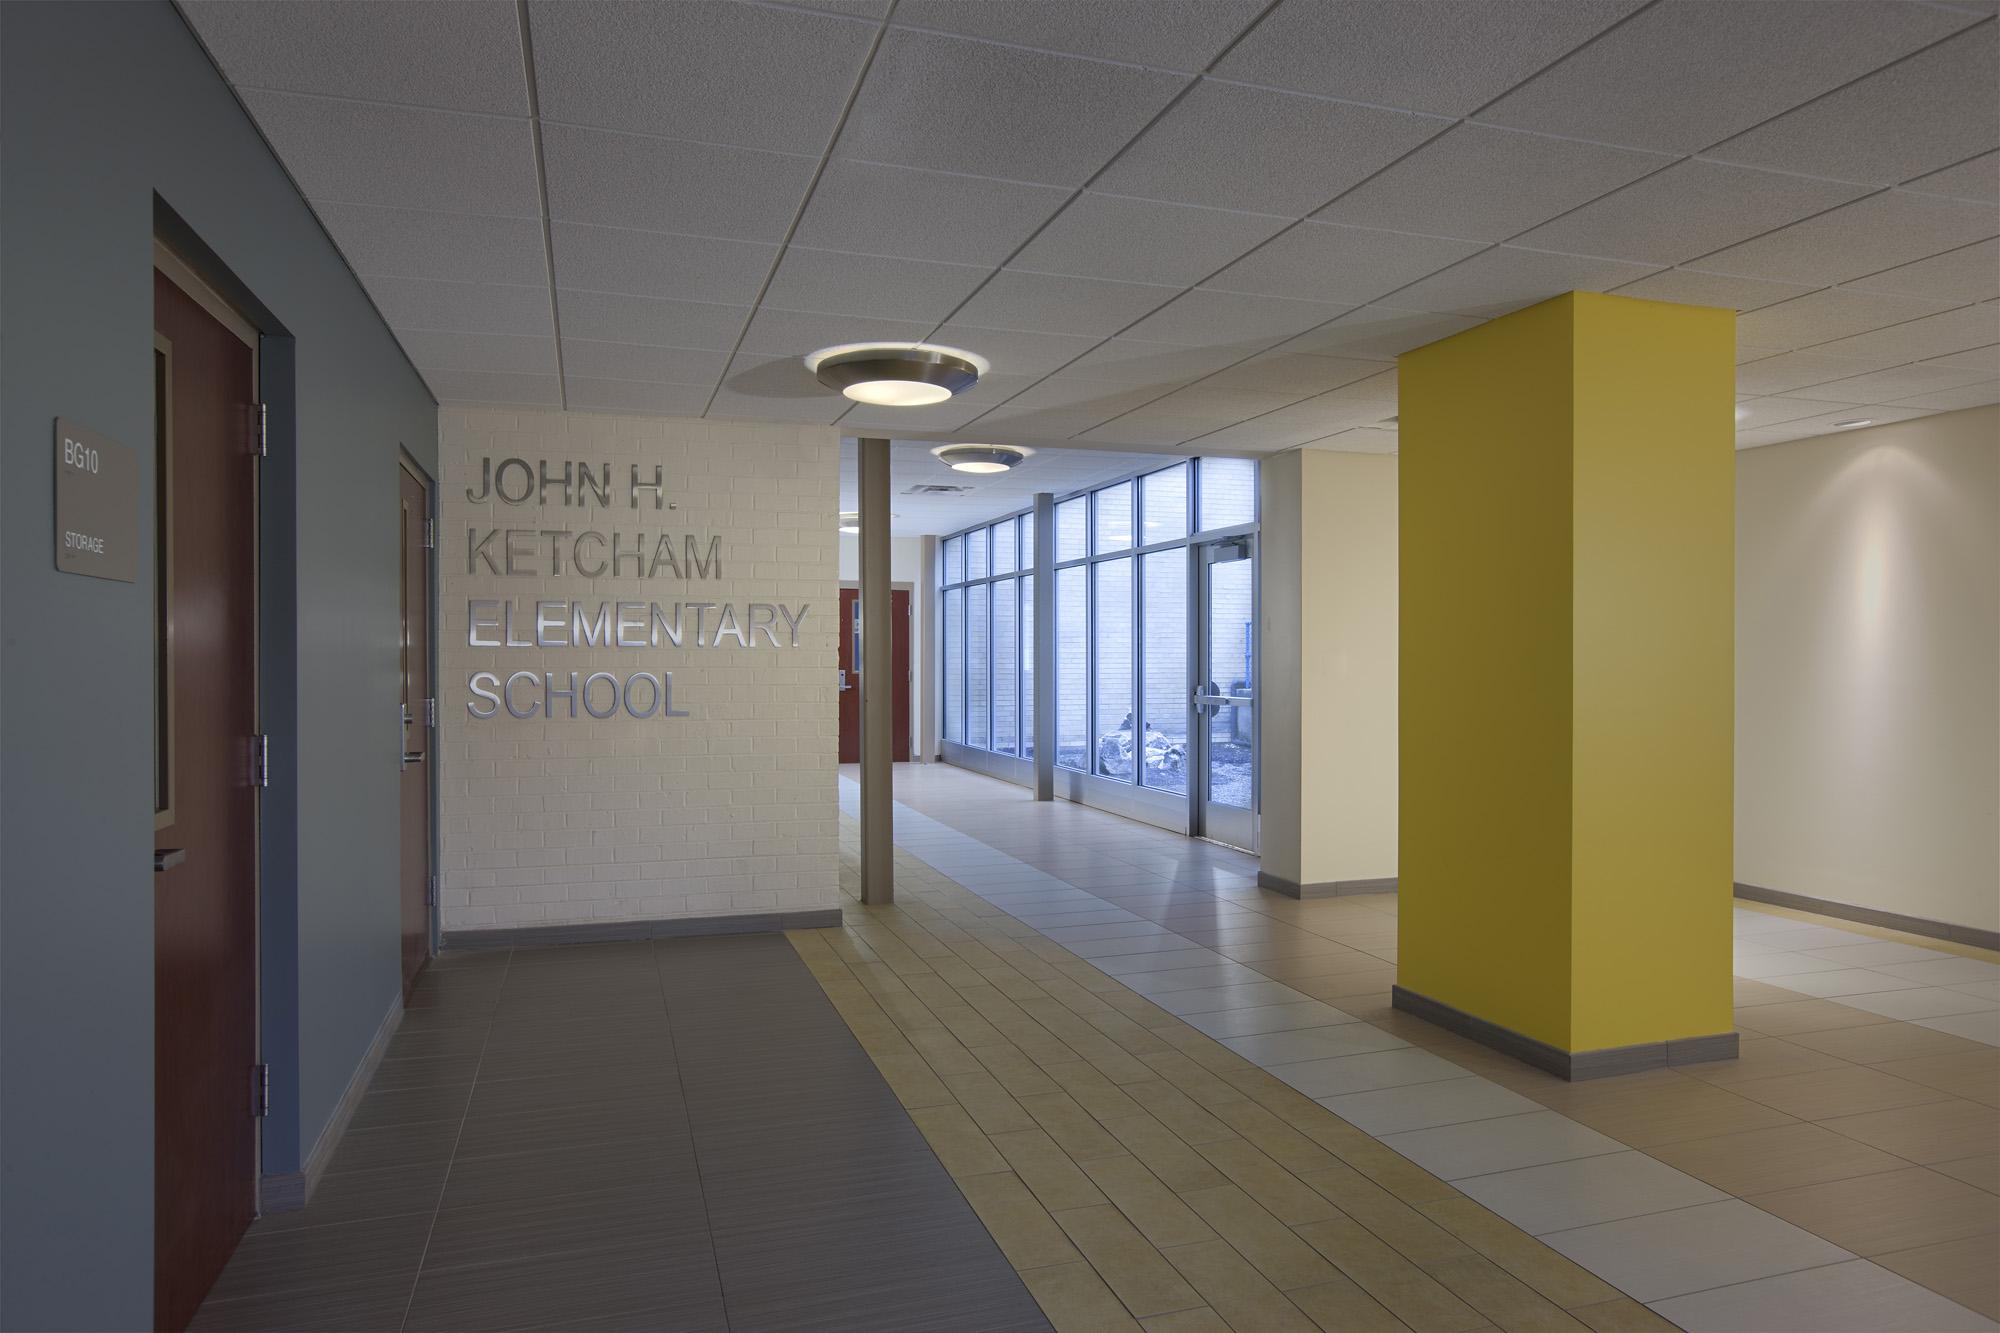 Interior Image of Ketcham Elementary School-139794.jpg